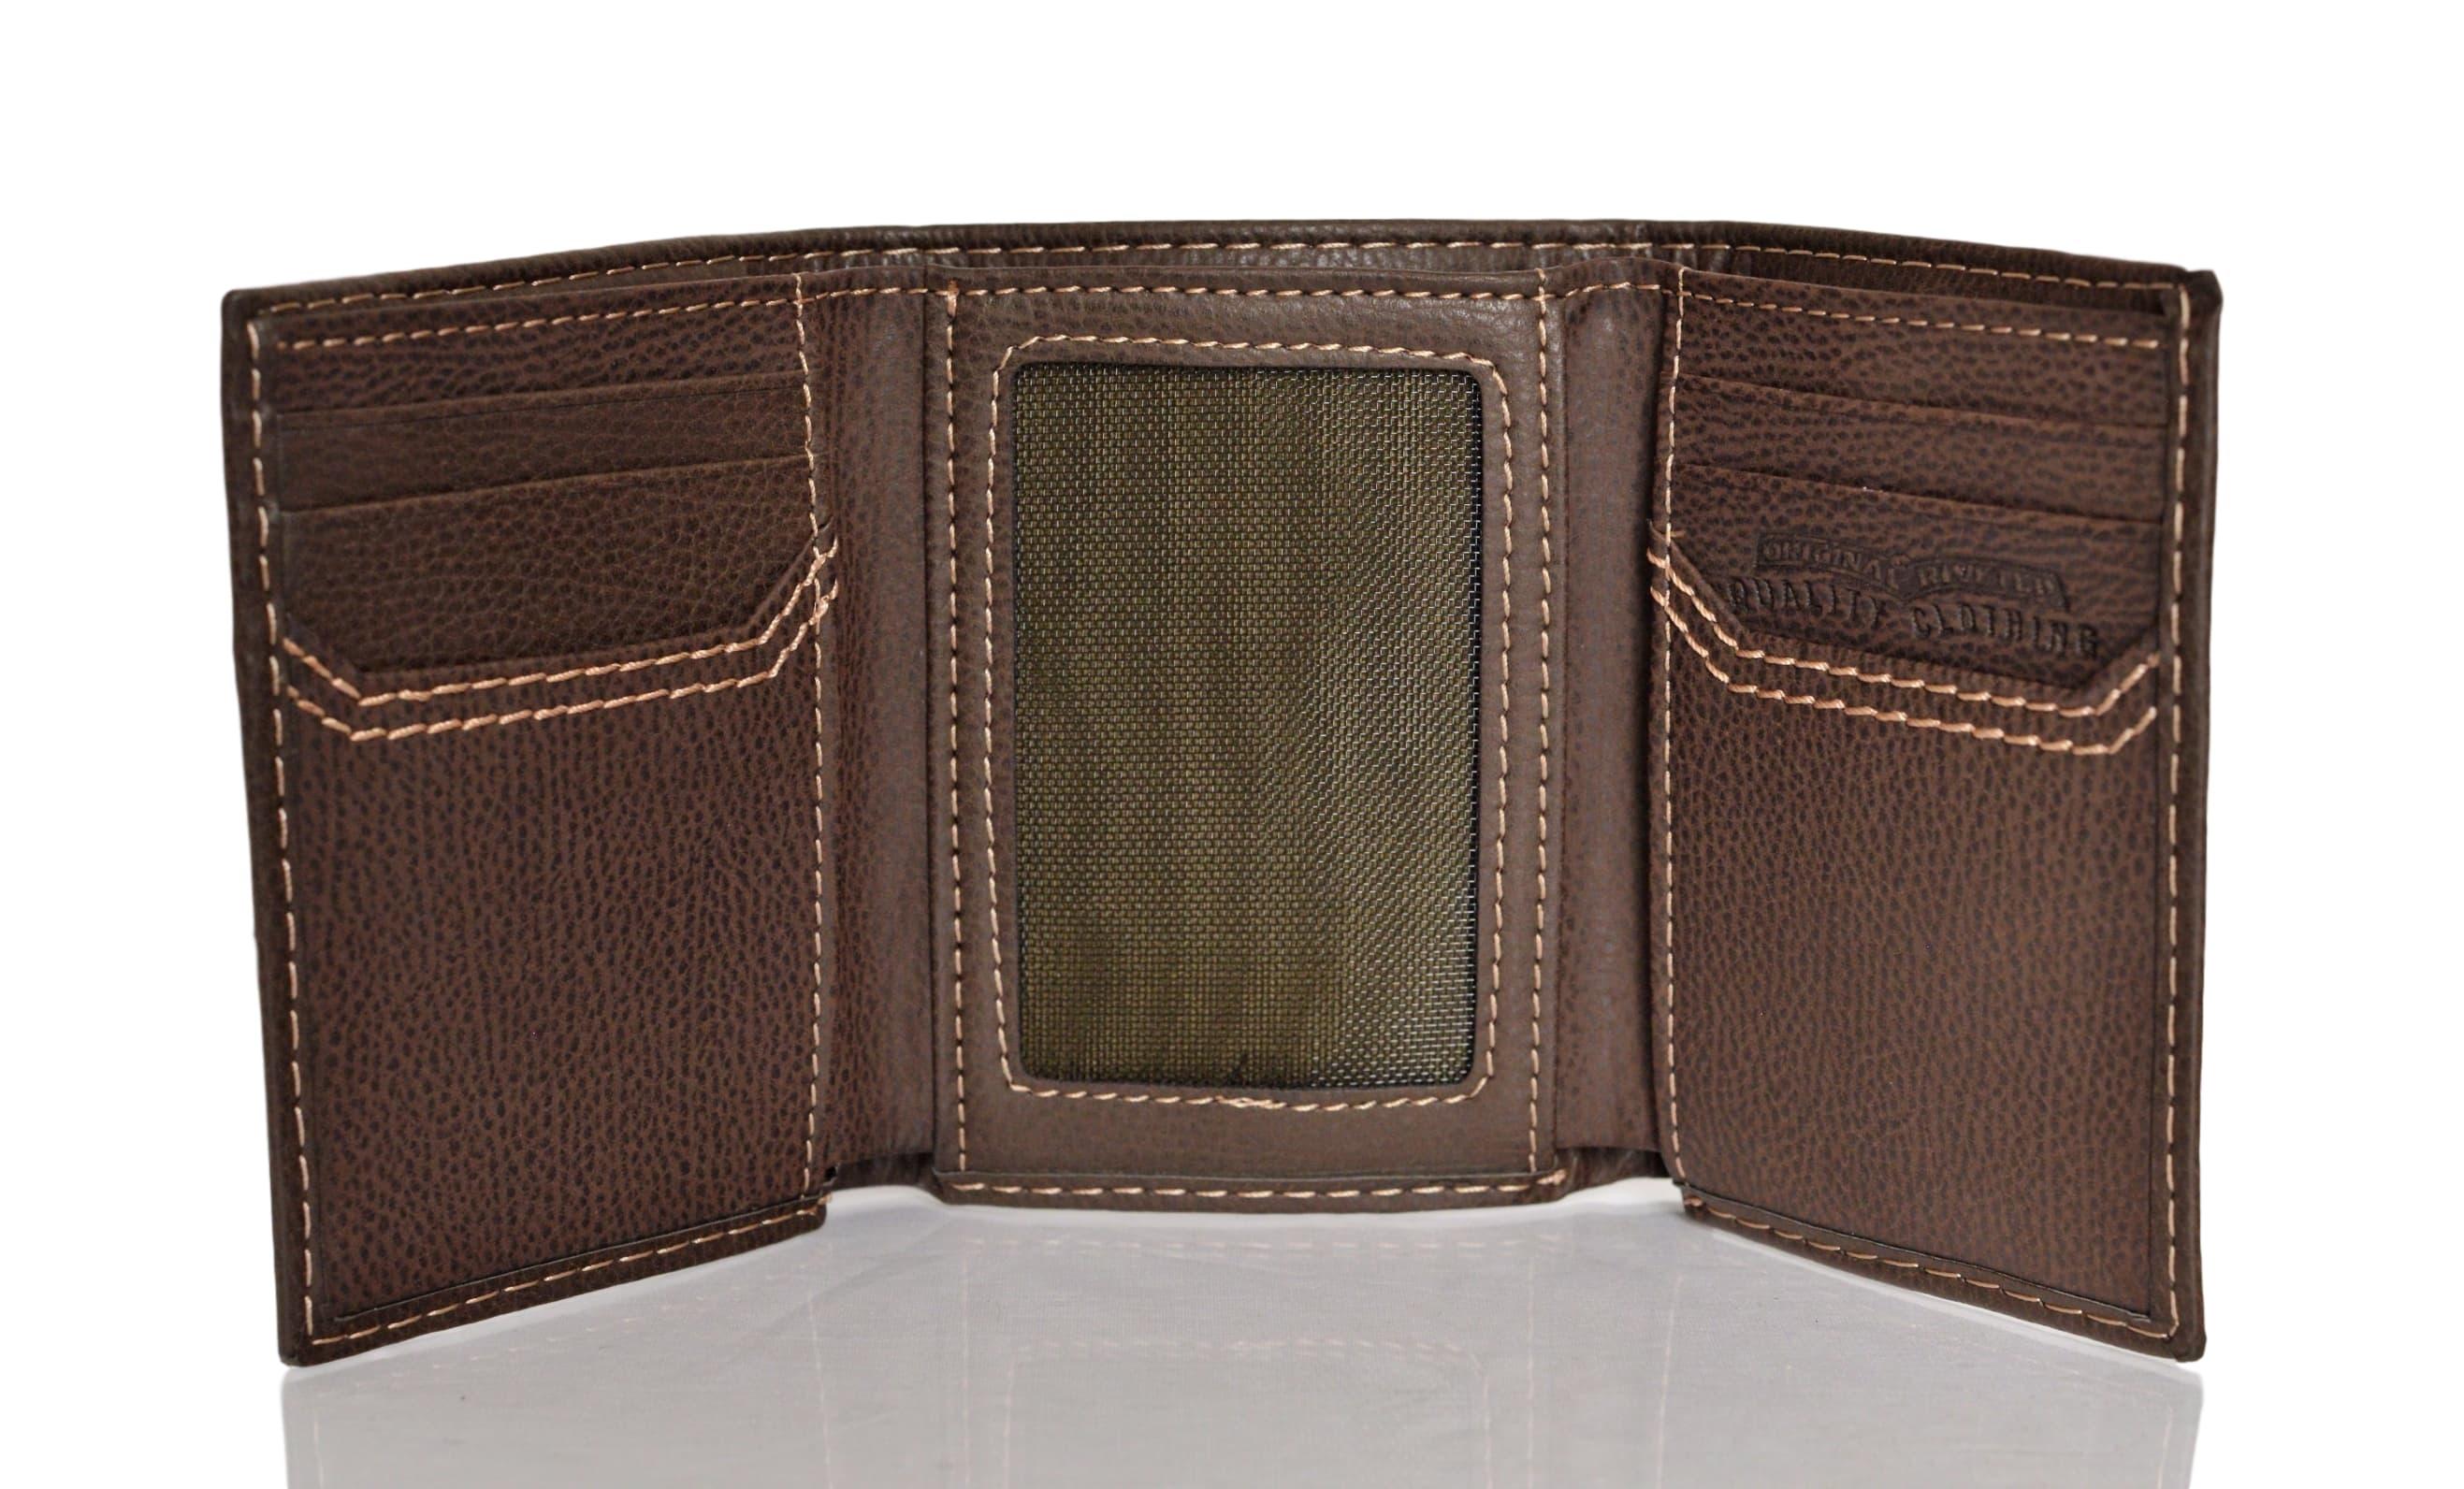 d092e3671655 Levi's Men's Trifold Wallet With Interior Zipper | Stanford Center ...